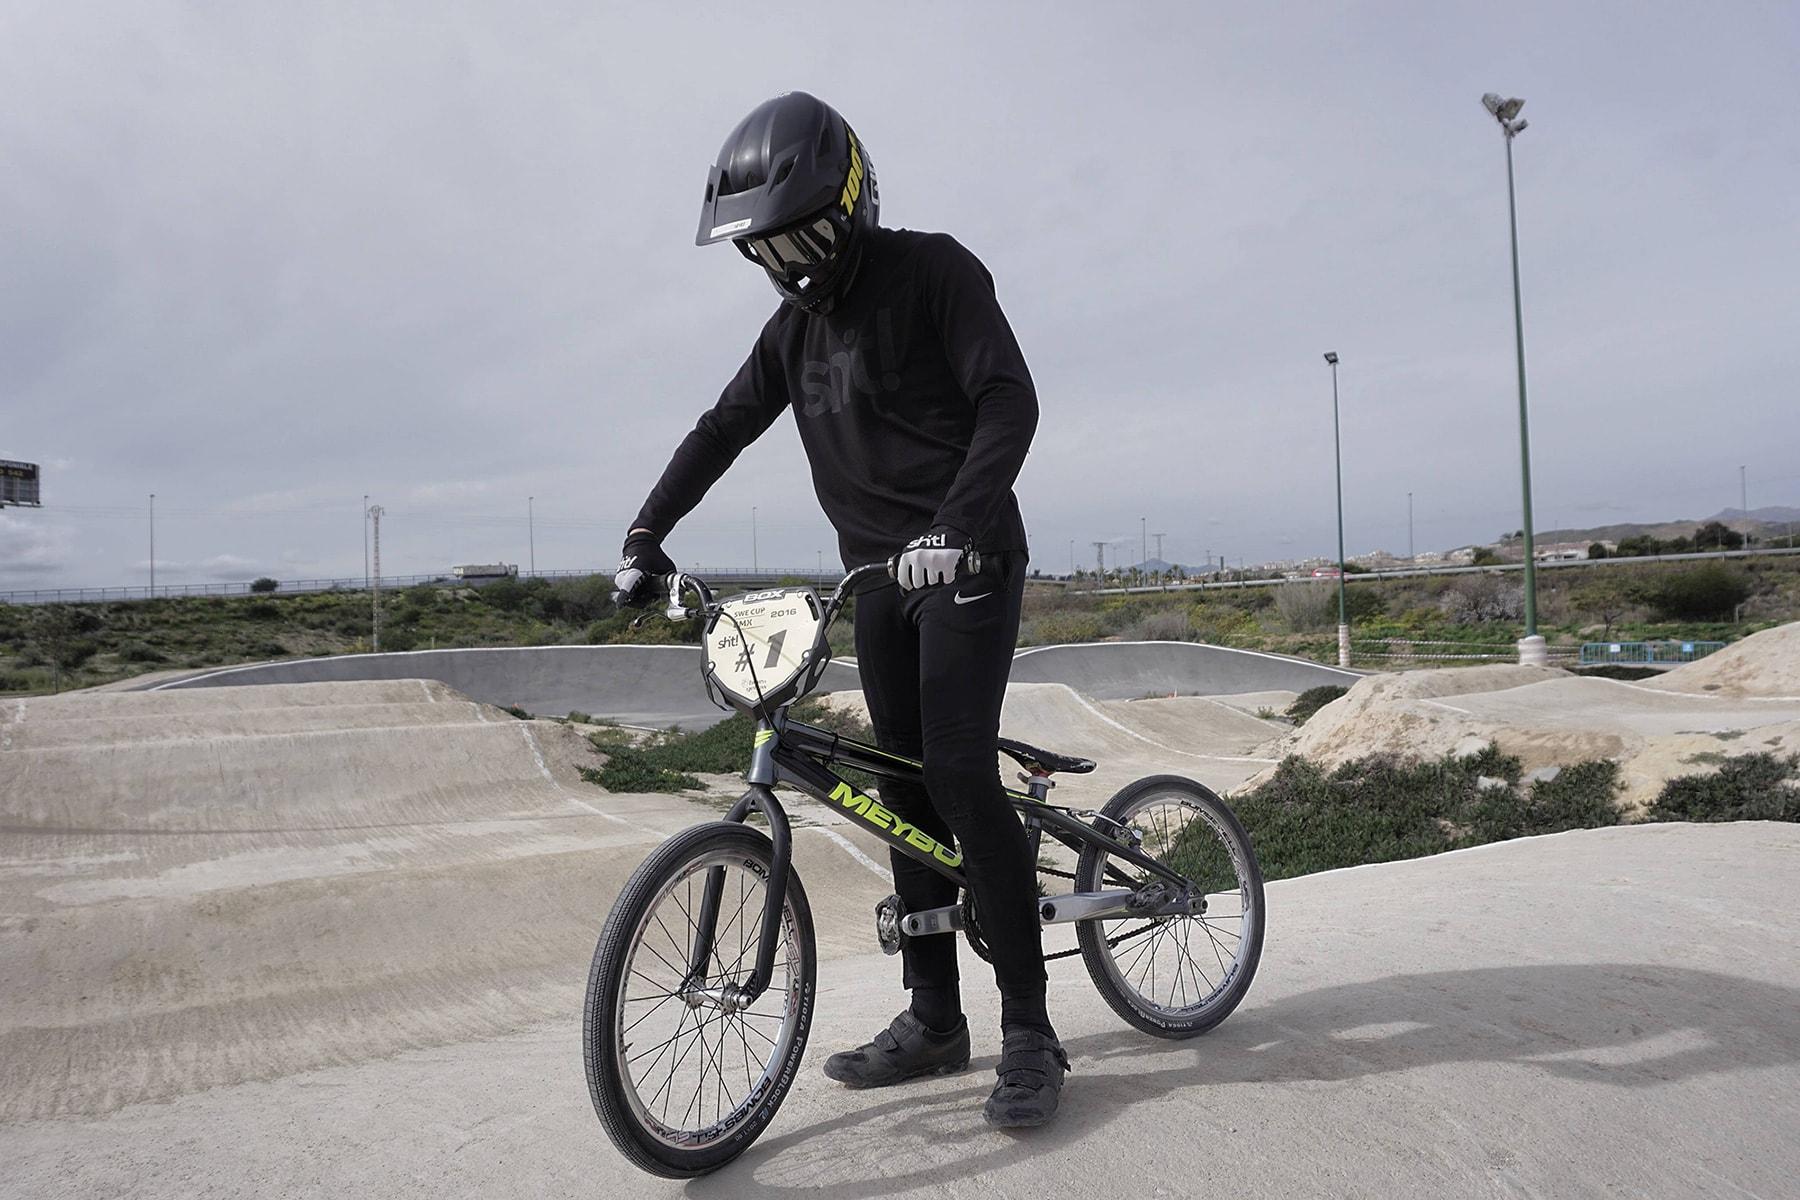 Oskar Kindblom bmx racing pose in Spain